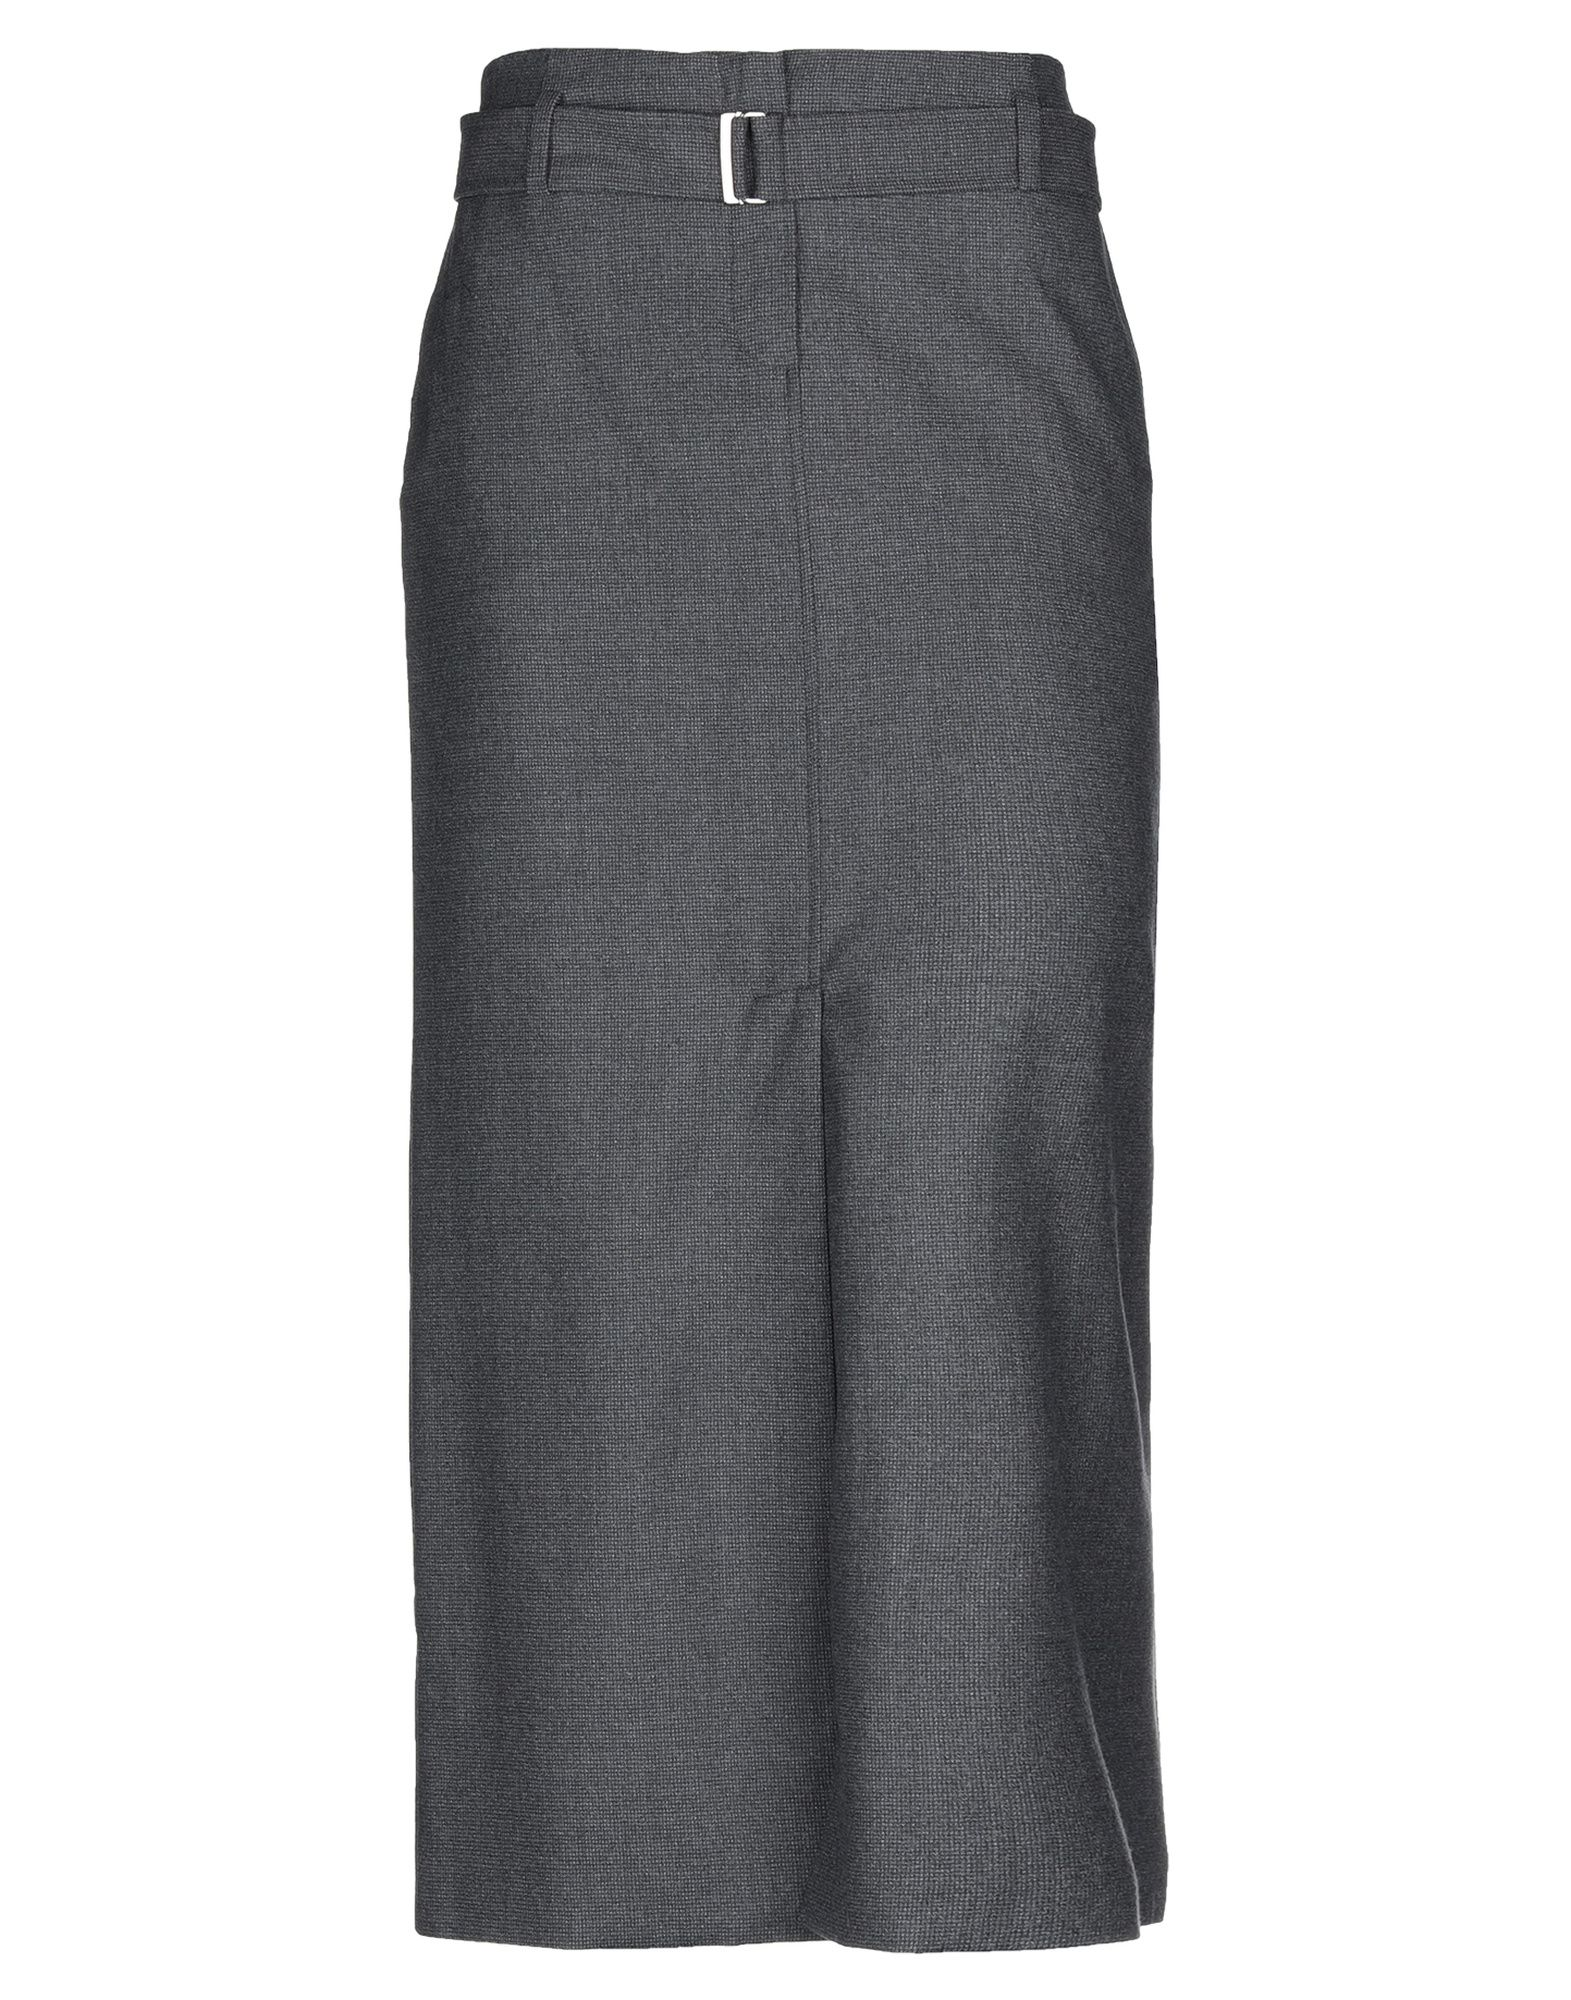 WEEKEND MAX MARA Длинная юбка юбка max mara weekend юбка